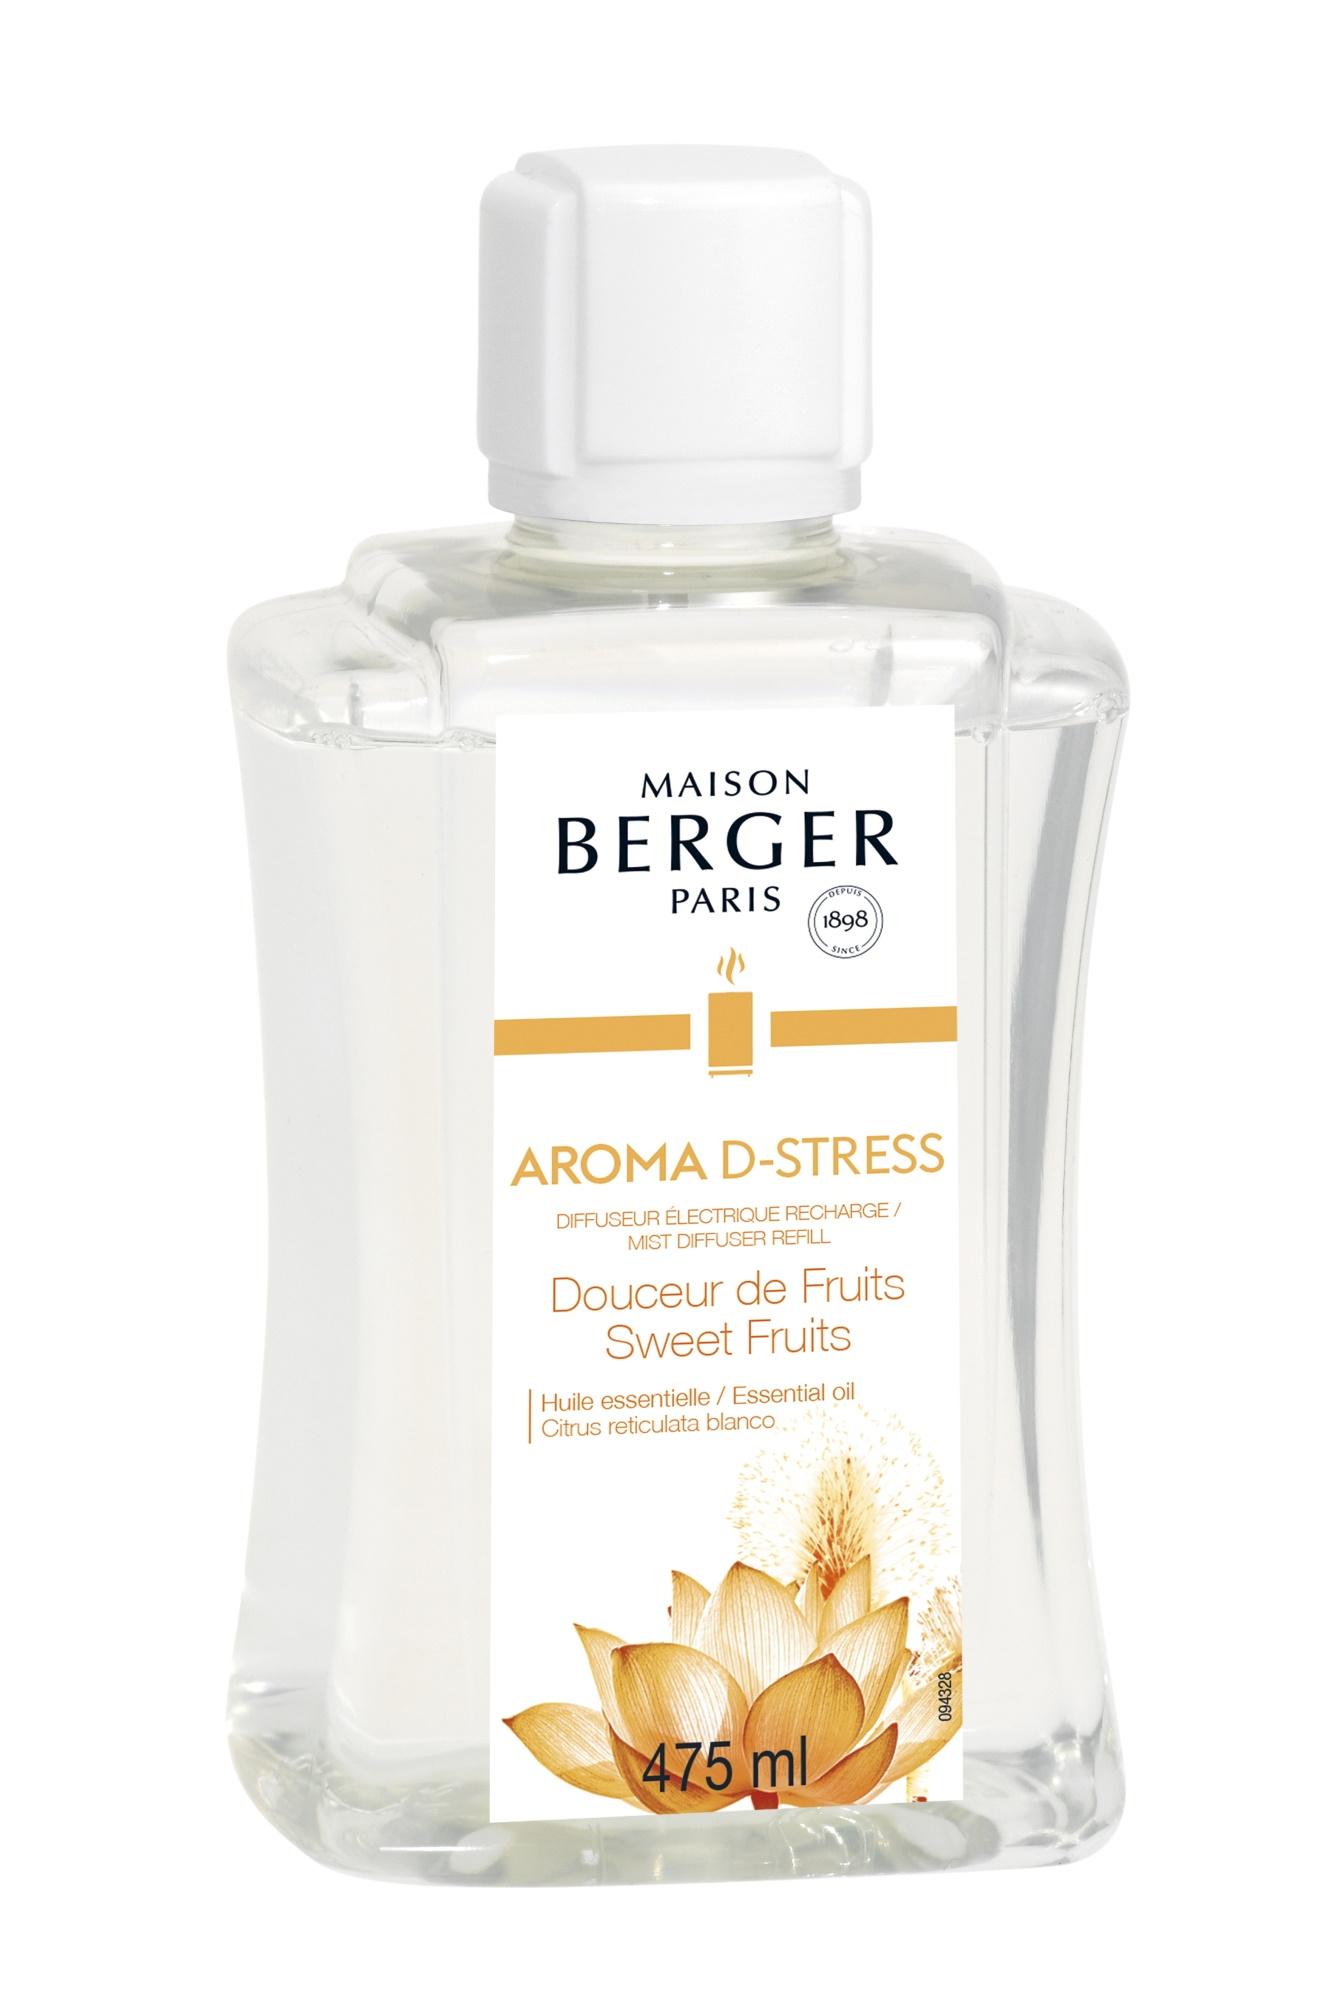 Parfum pentru difuzor ultrasonic Berger Aroma D-Stress 475ml poza